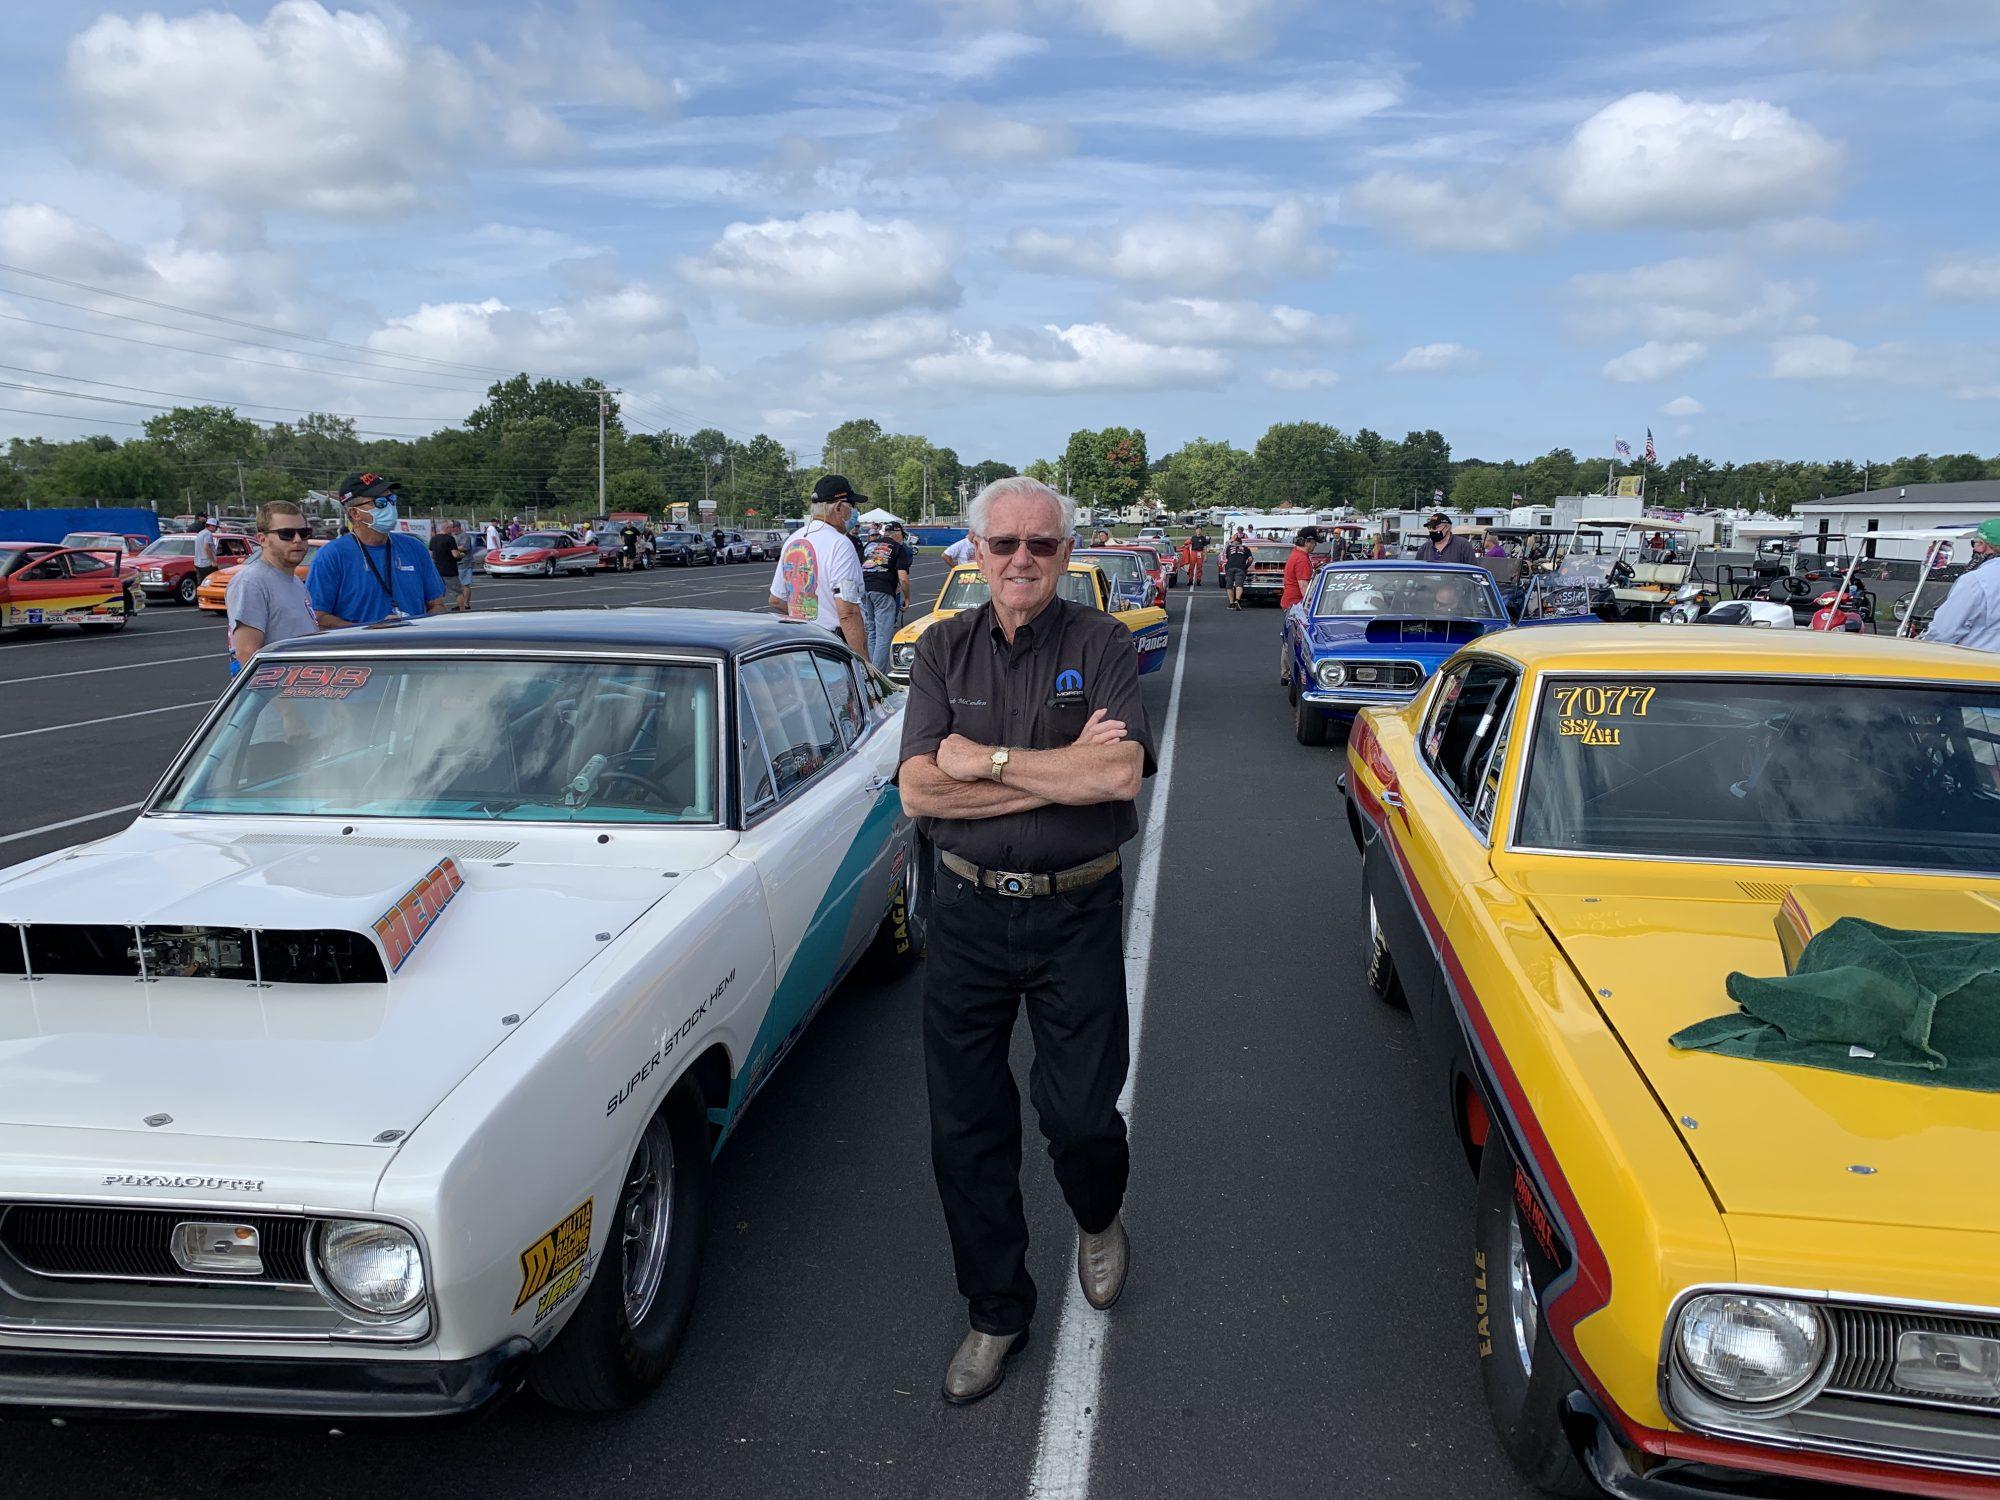 Herb McCandless posing next to race cars